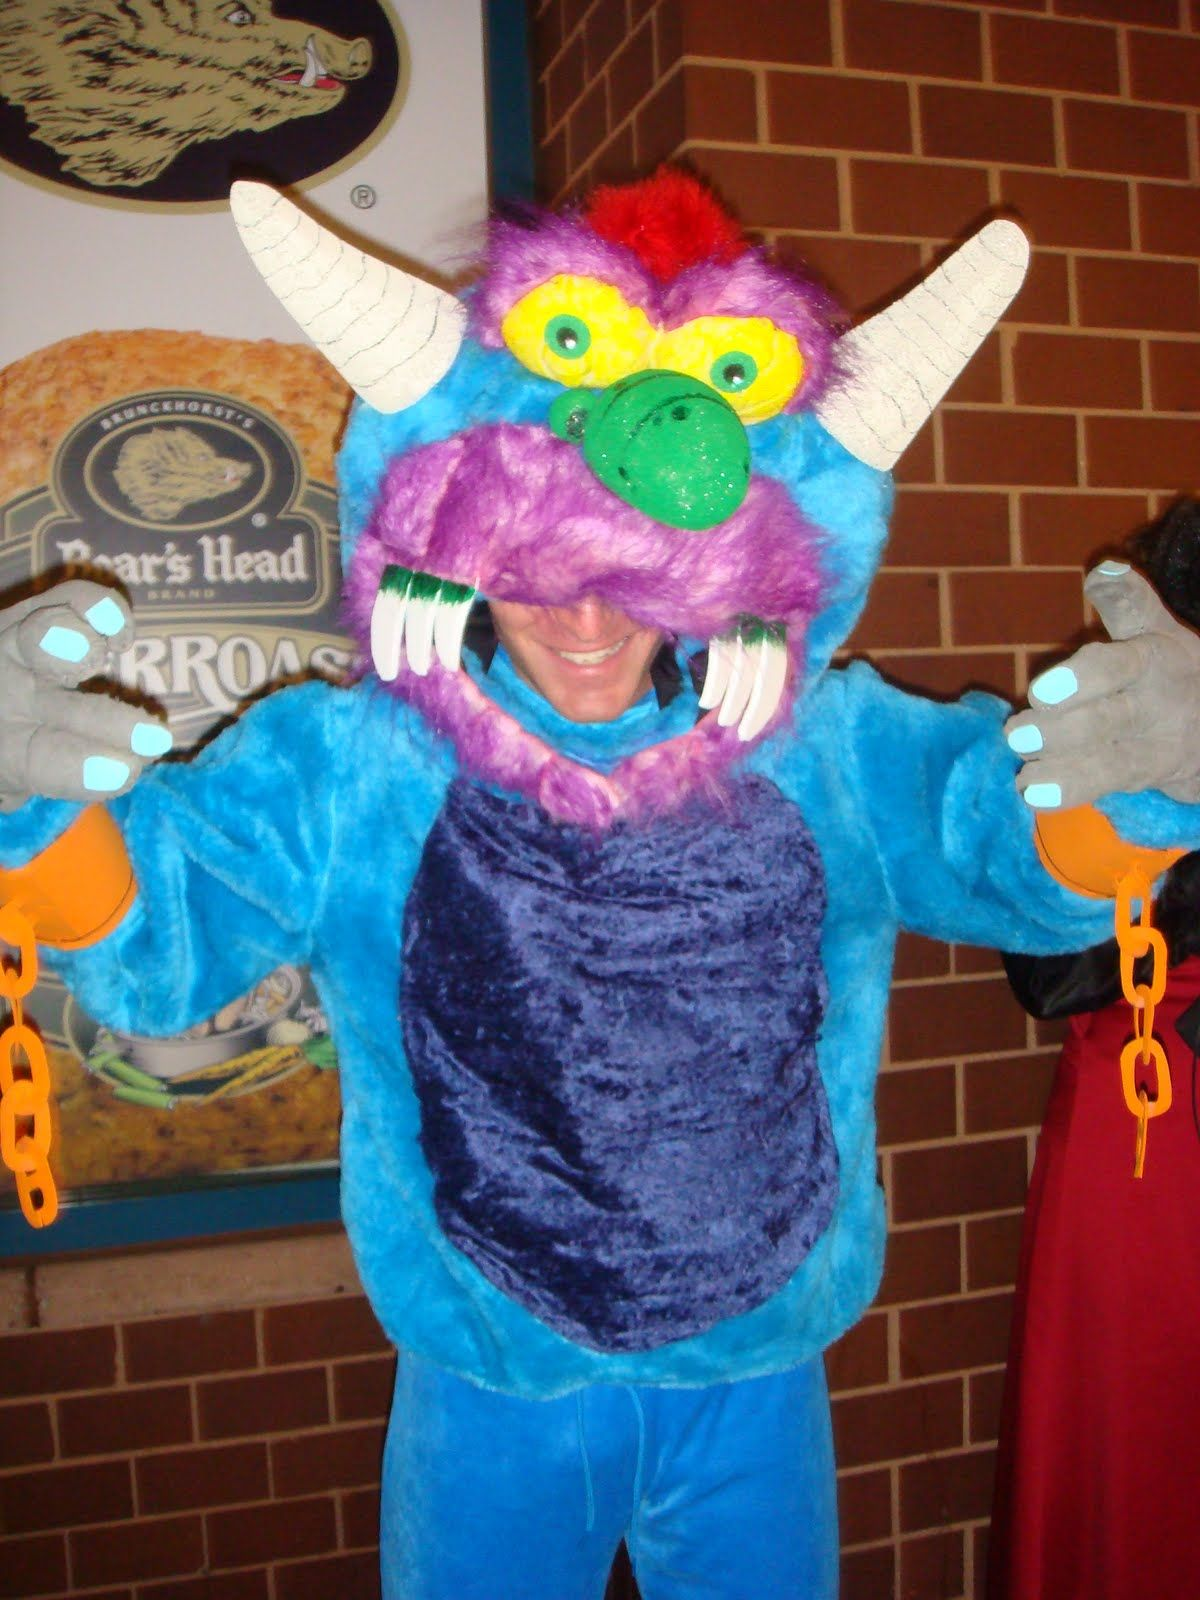 MY PET MONSTER Halloween Adult COSTUME MASK Colorful Fun Ben Cooper NEW | Collectibles, Holiday & Seasonal, Halloween | eBay!